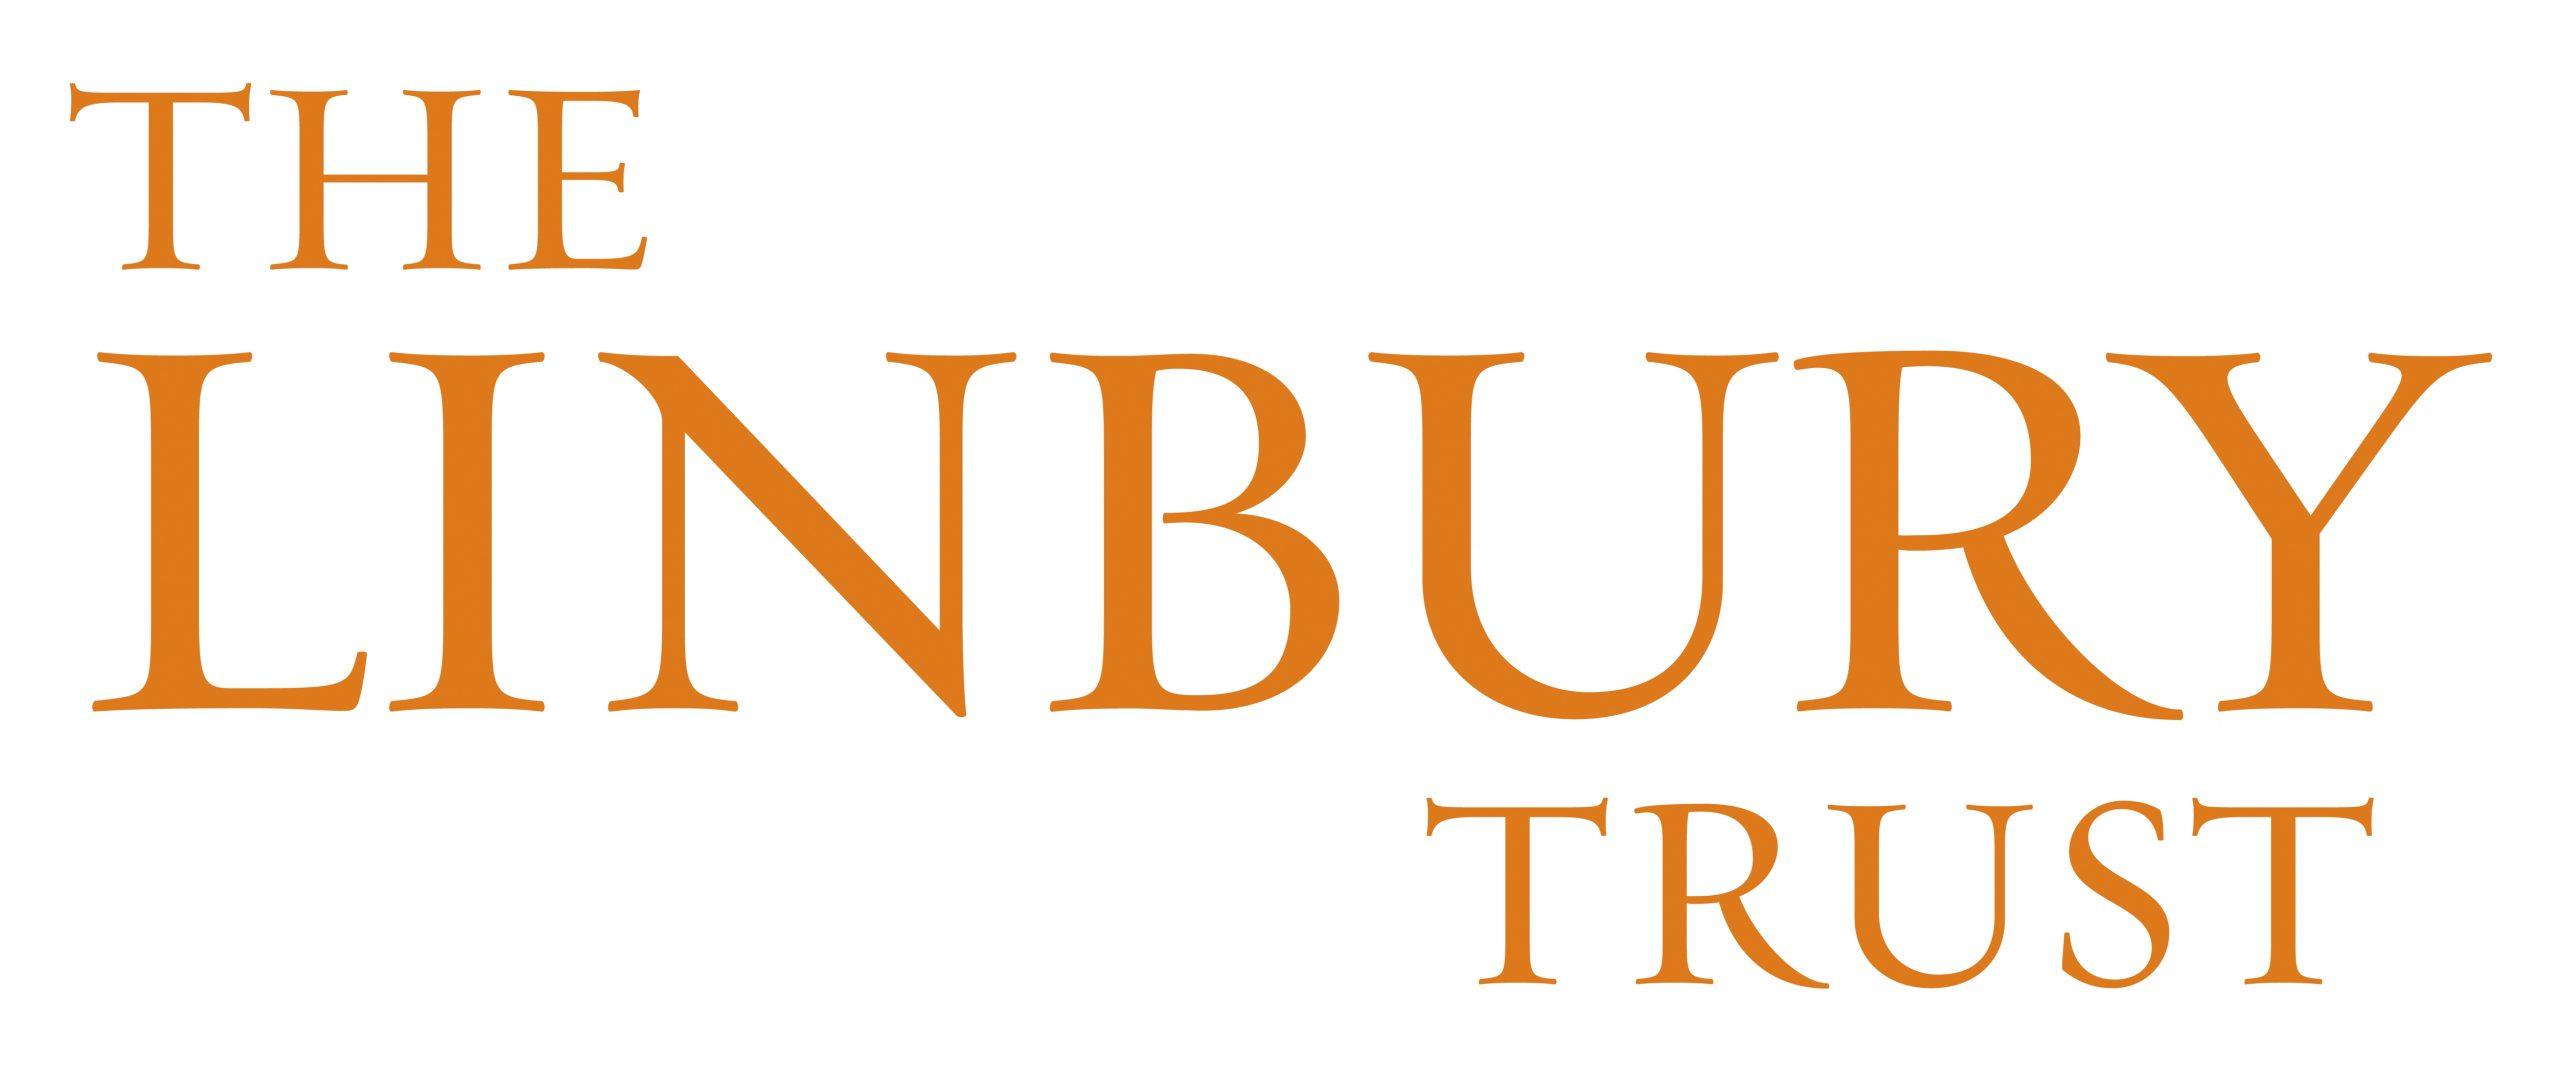 Logo in orange serif font reads The Linbury Trust